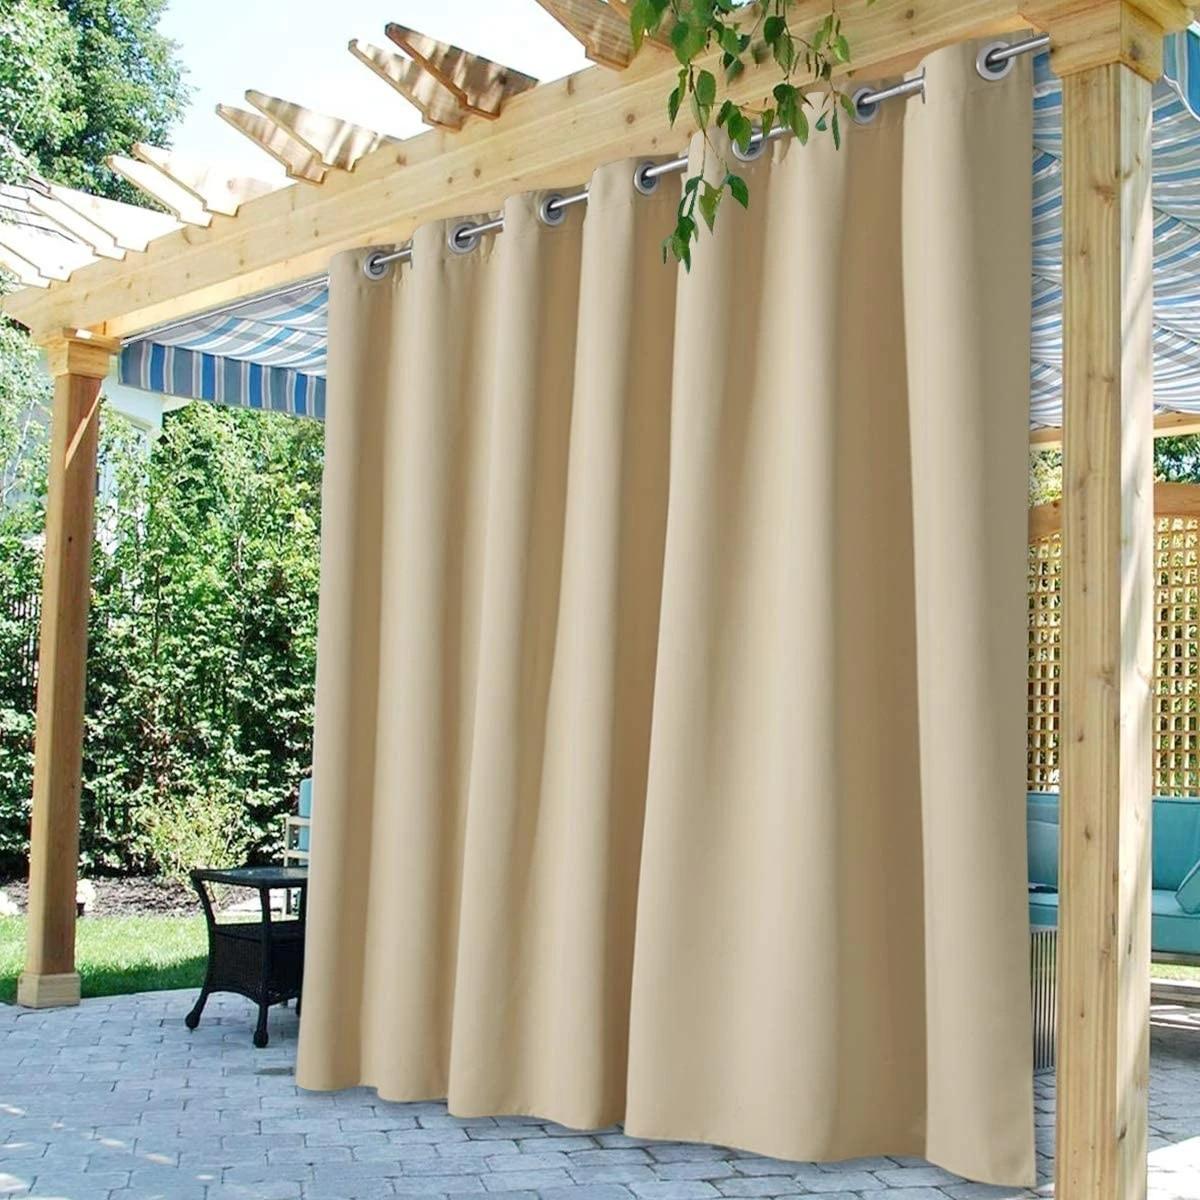 waterproof outdoor curtain panels blackout patio beige farmhouse curtains custom 1 panel